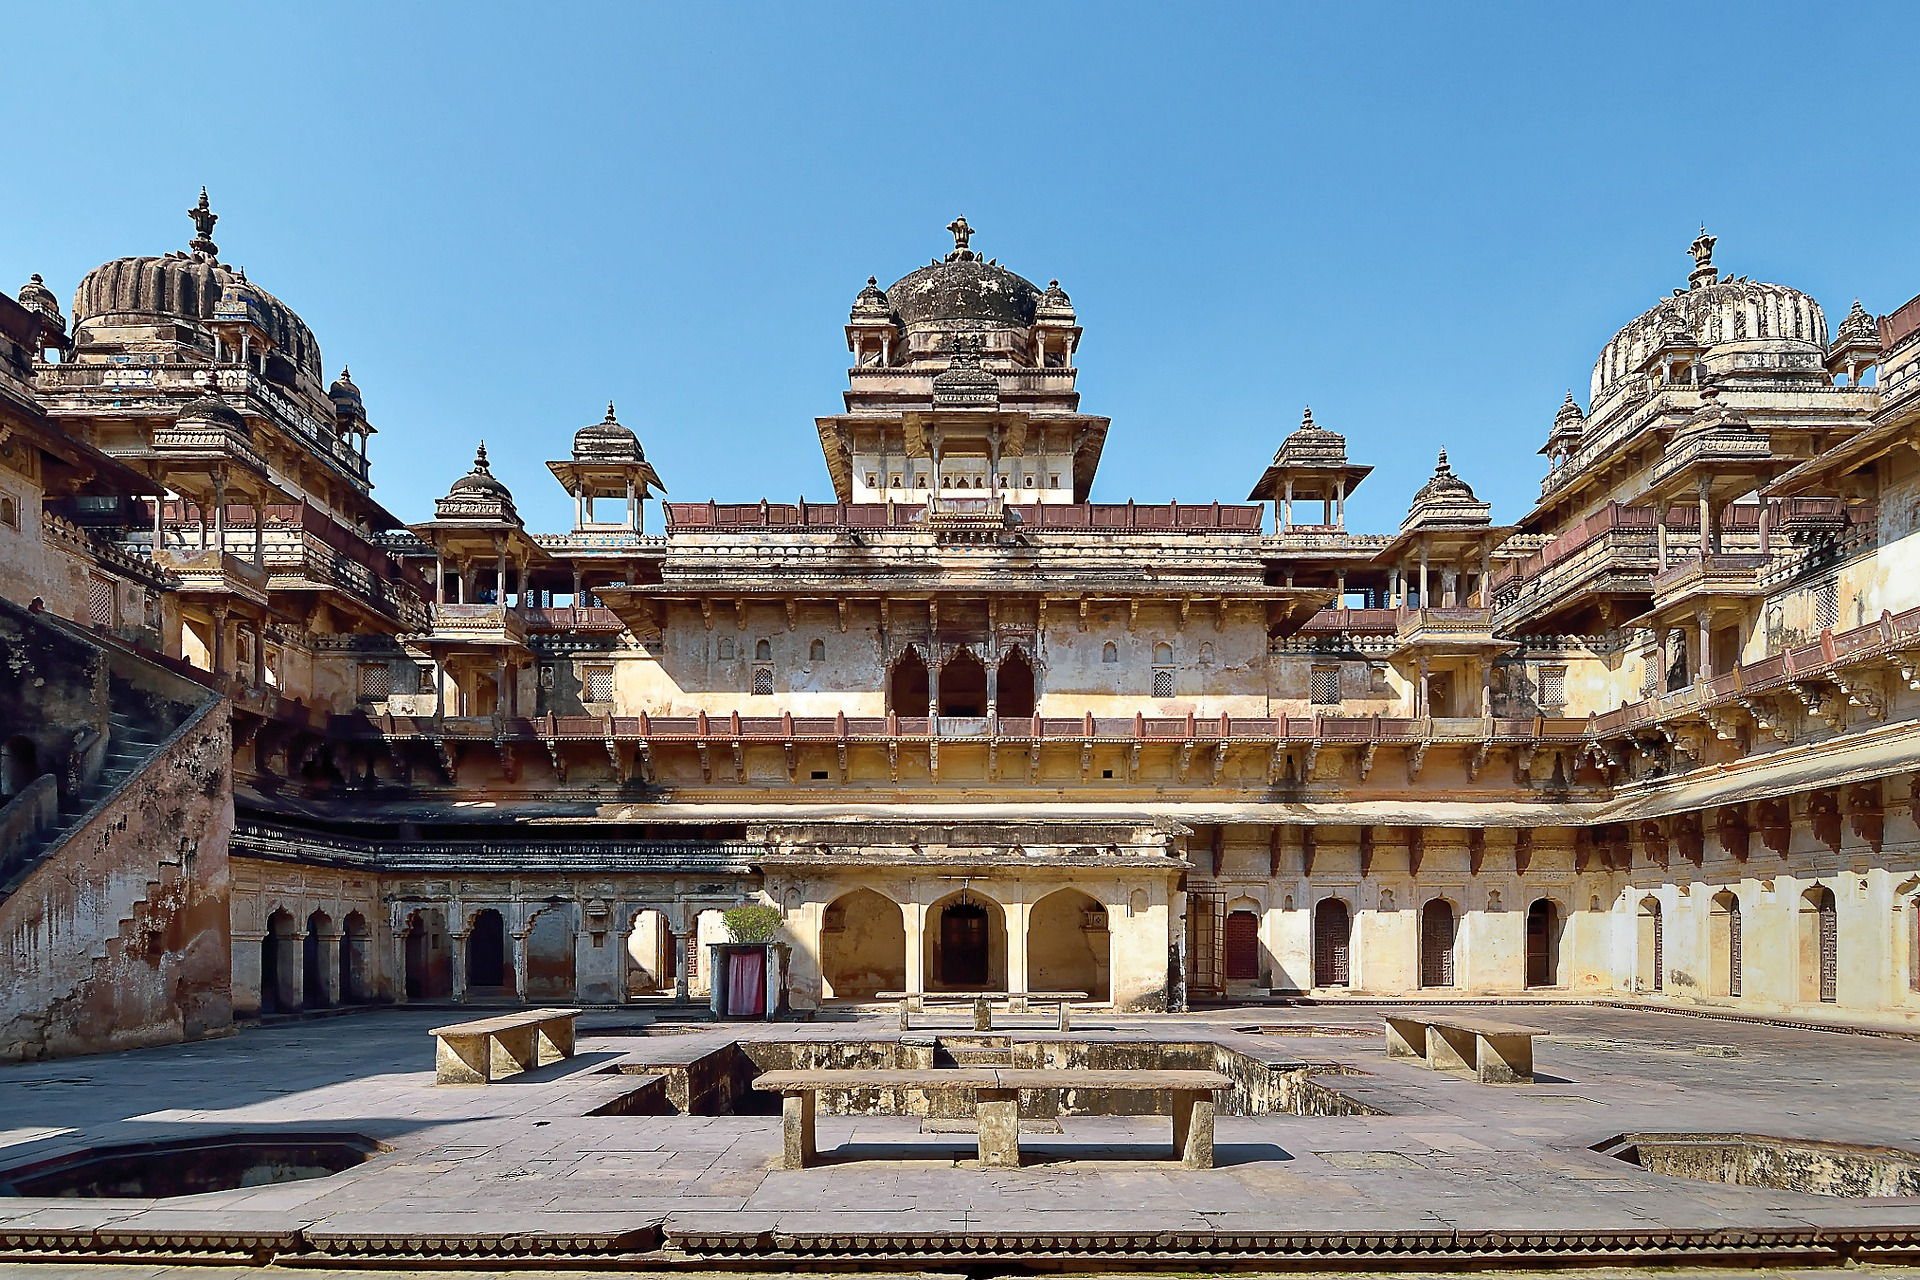 Golden India - Orchha Fort, India